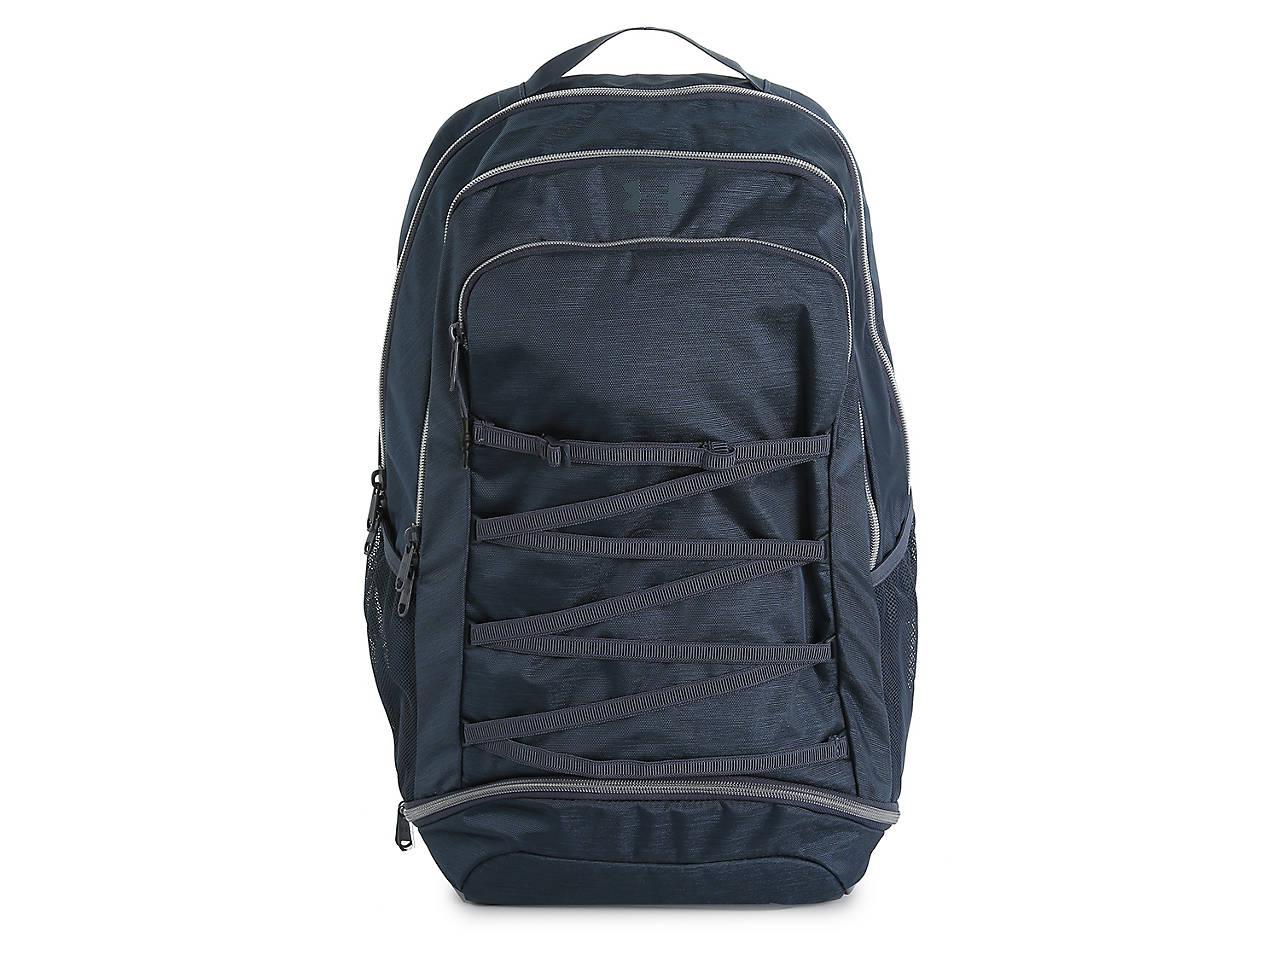 5d0f185670f469 Under Armour Imprint Backpack Kids Handbags & Accessories | DSW